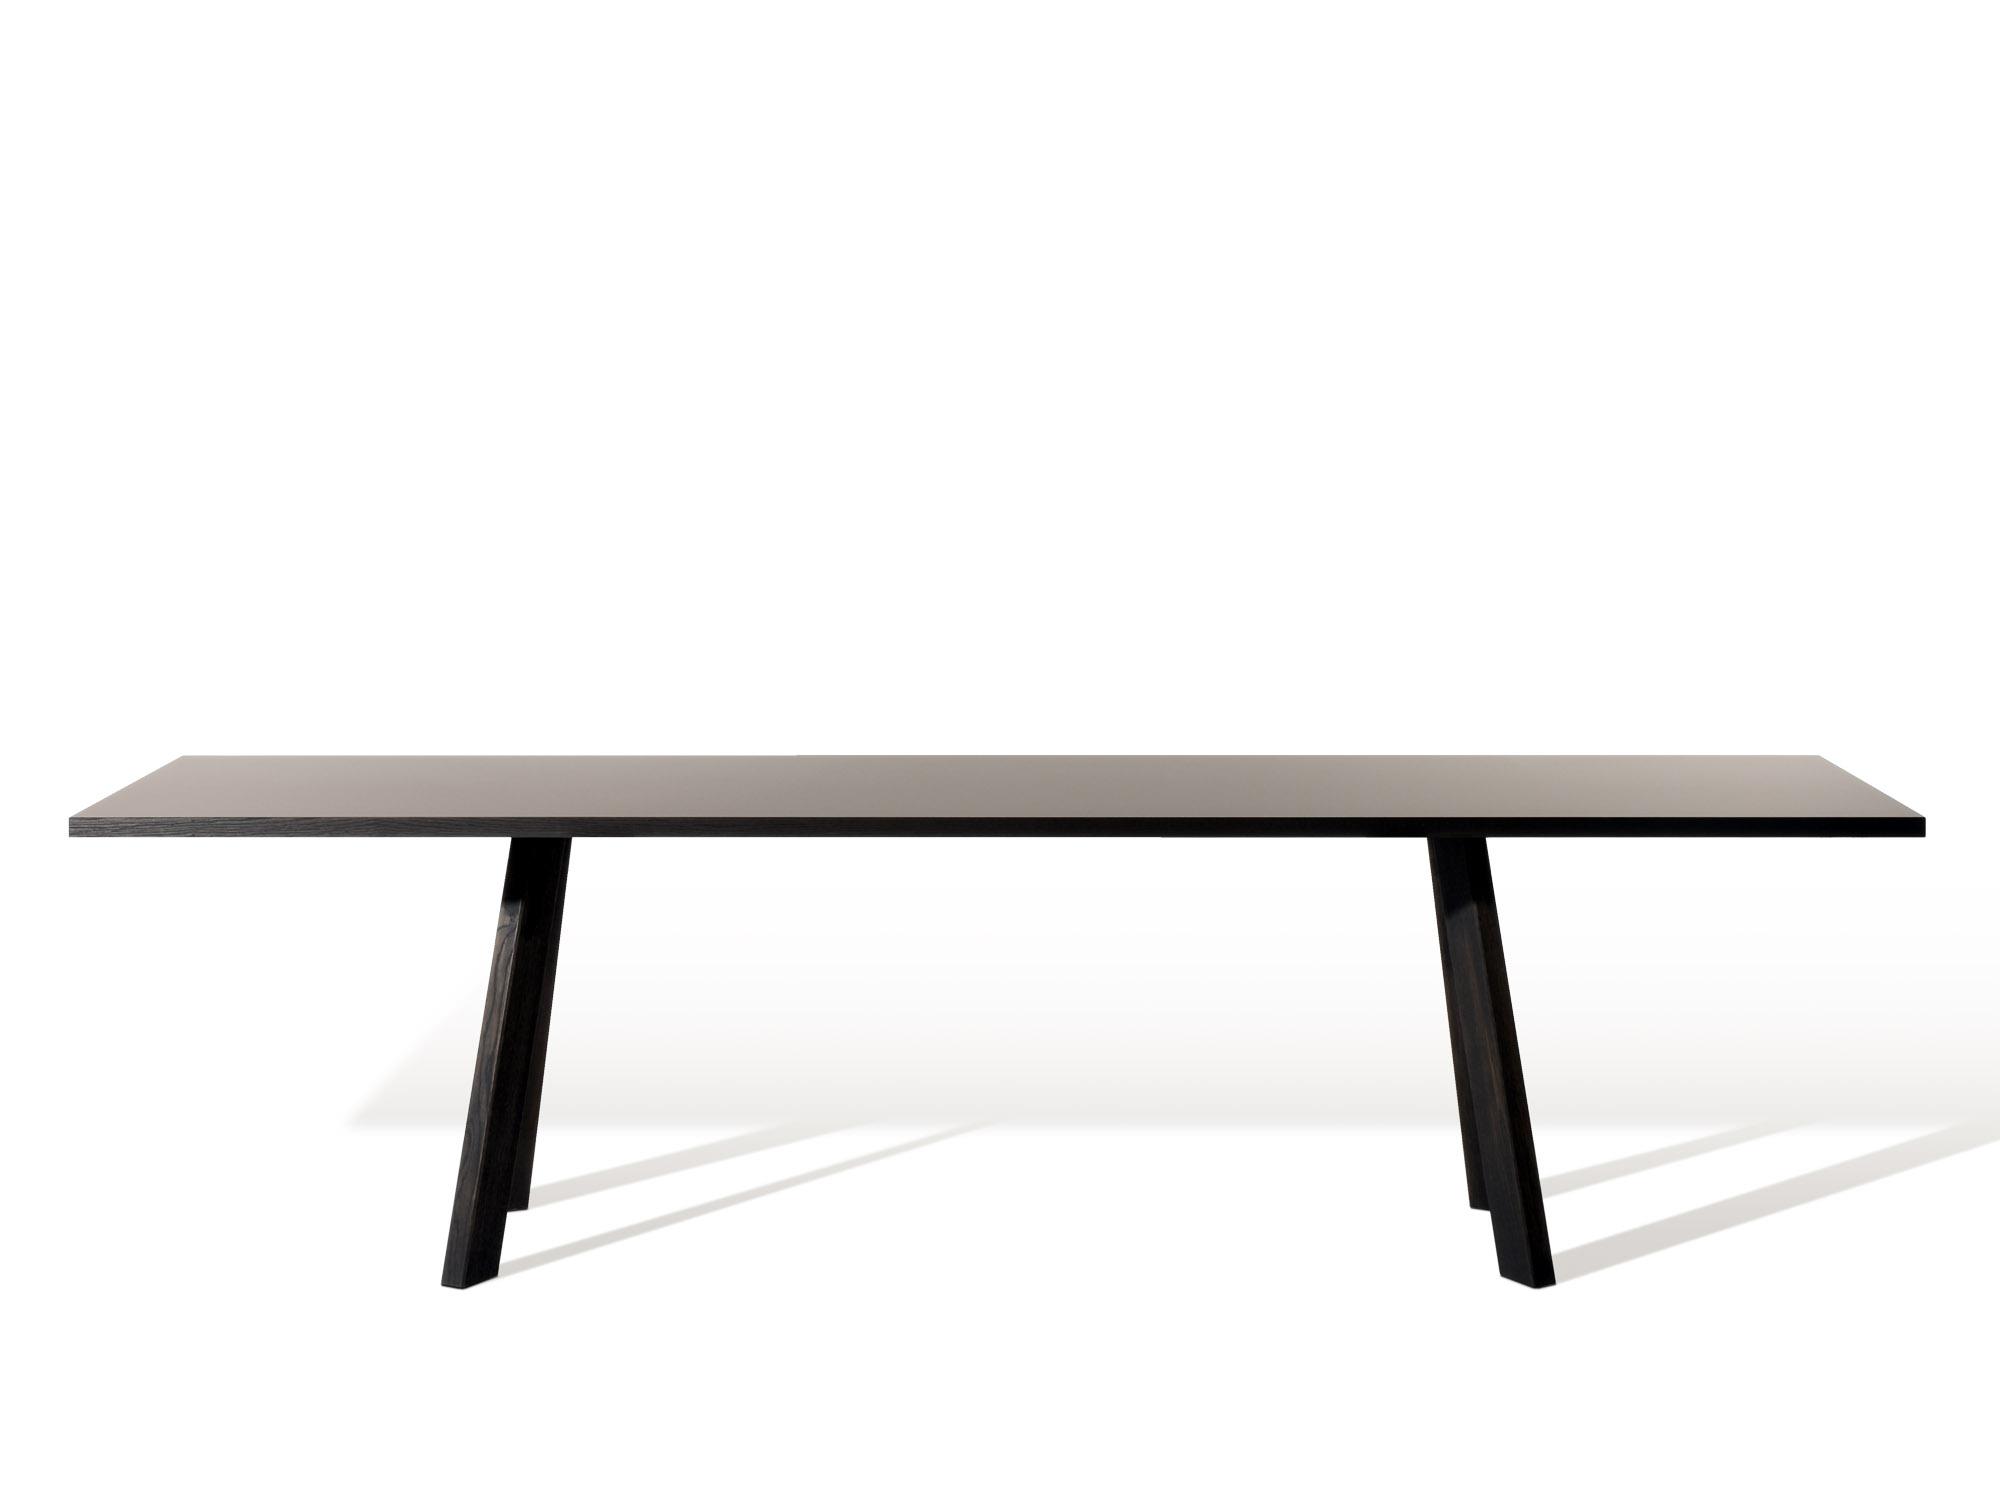 Castelijn TXS tafel - design by Coen Castelijn